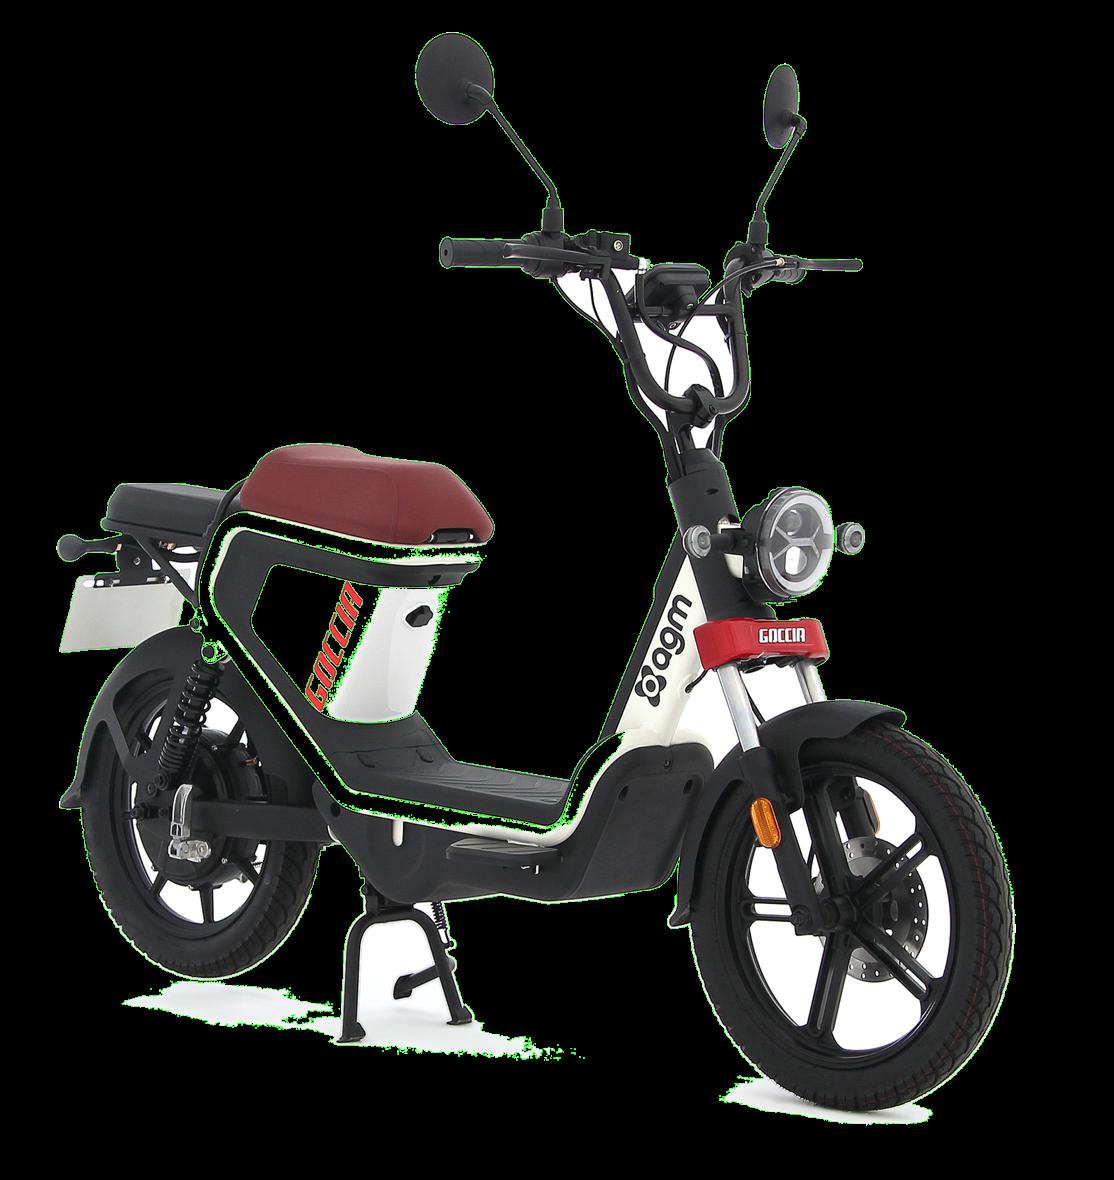 AGM Goccia GEV1000 E-Scooter. ACTIE!!